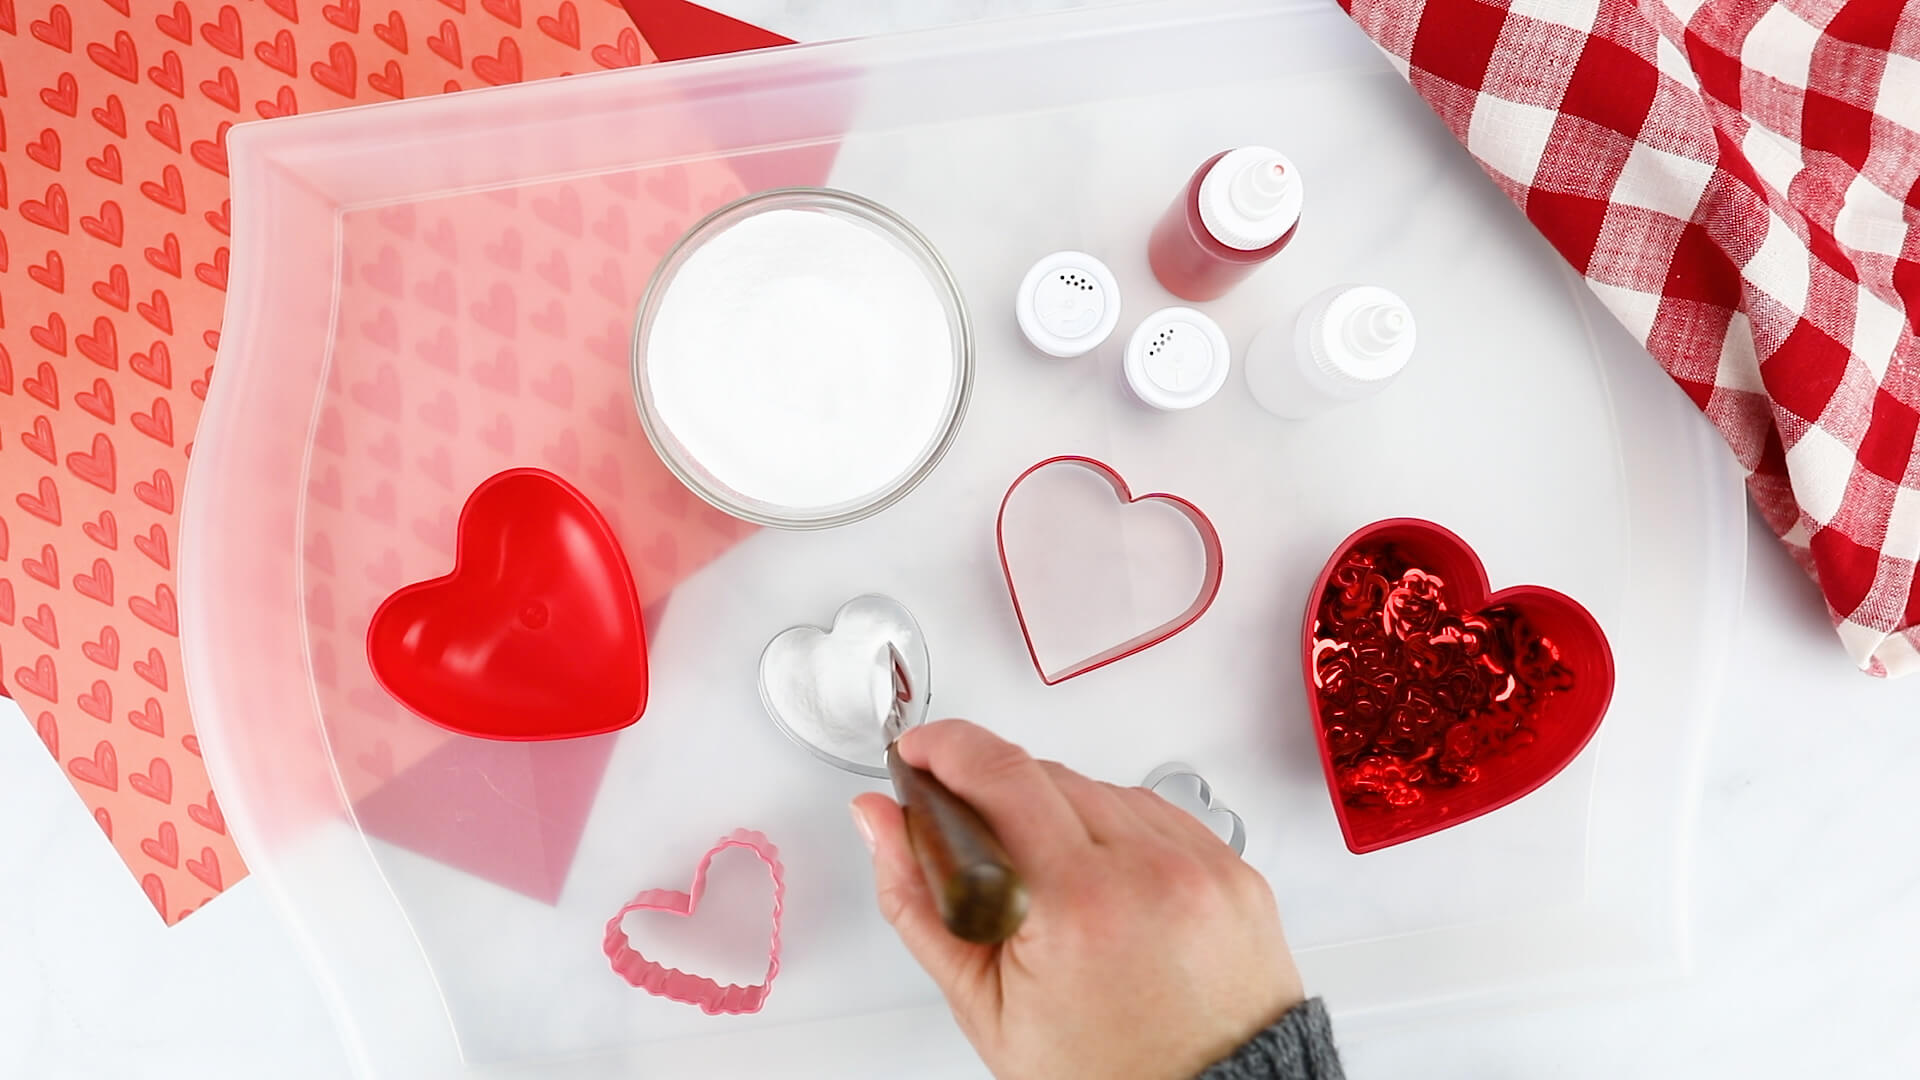 Valentines Baking Soda Vinegar Experiment for Valentines